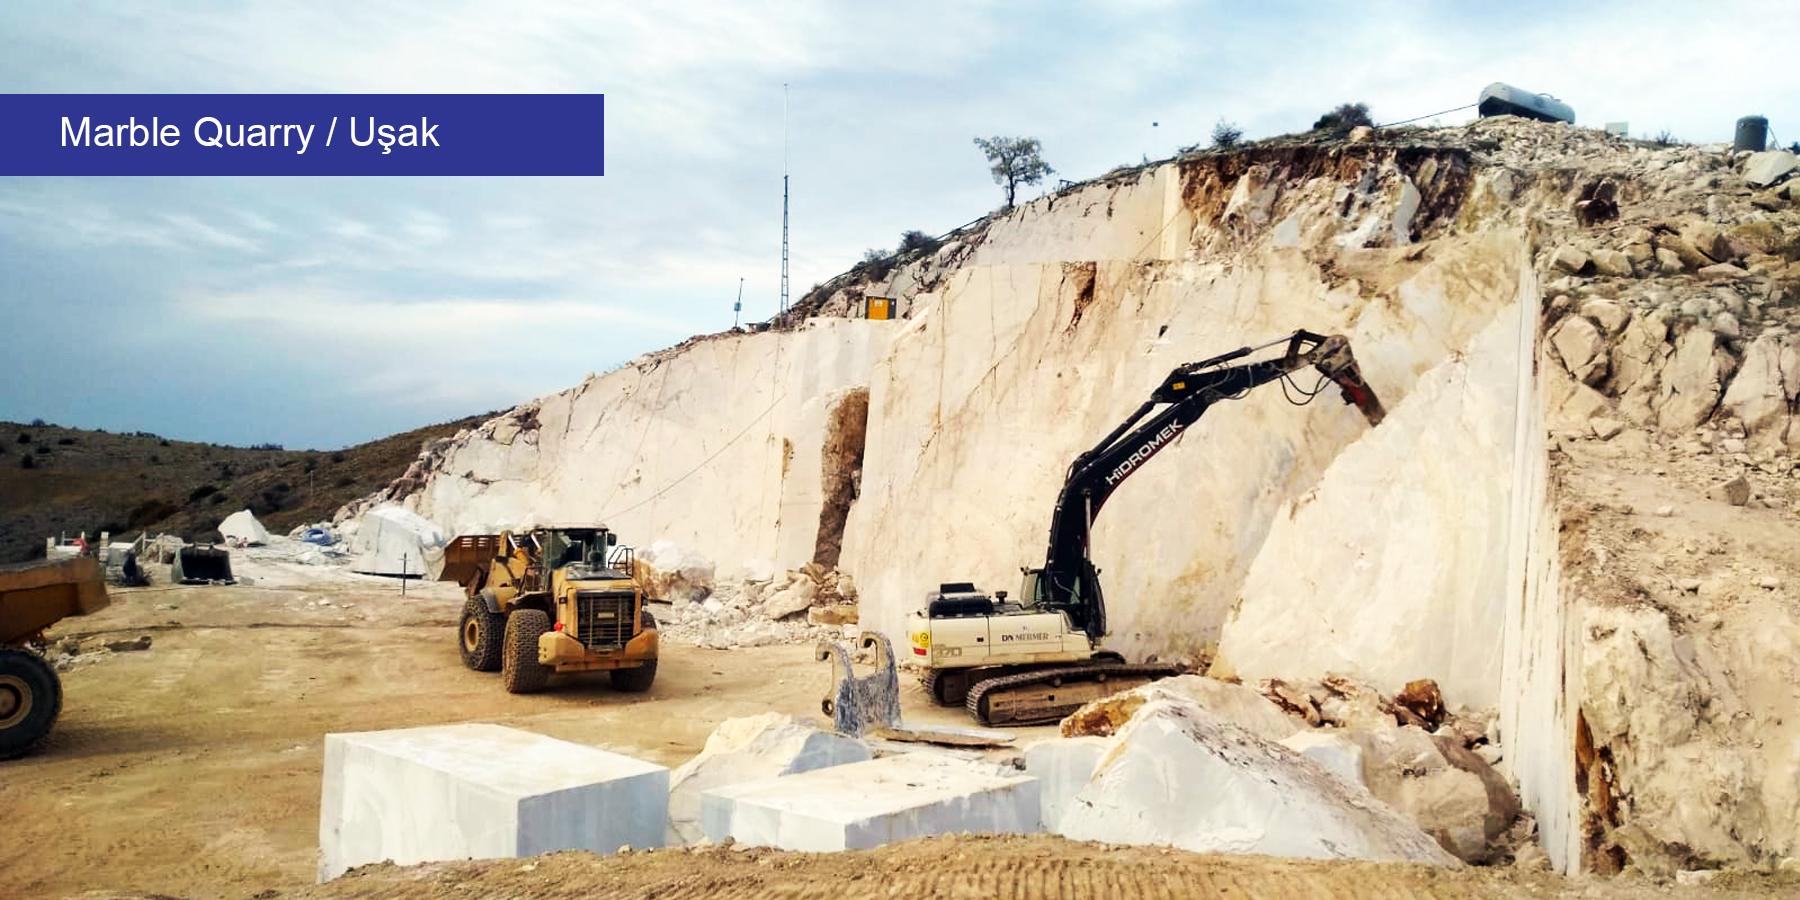 Marble Quarry / Uşak